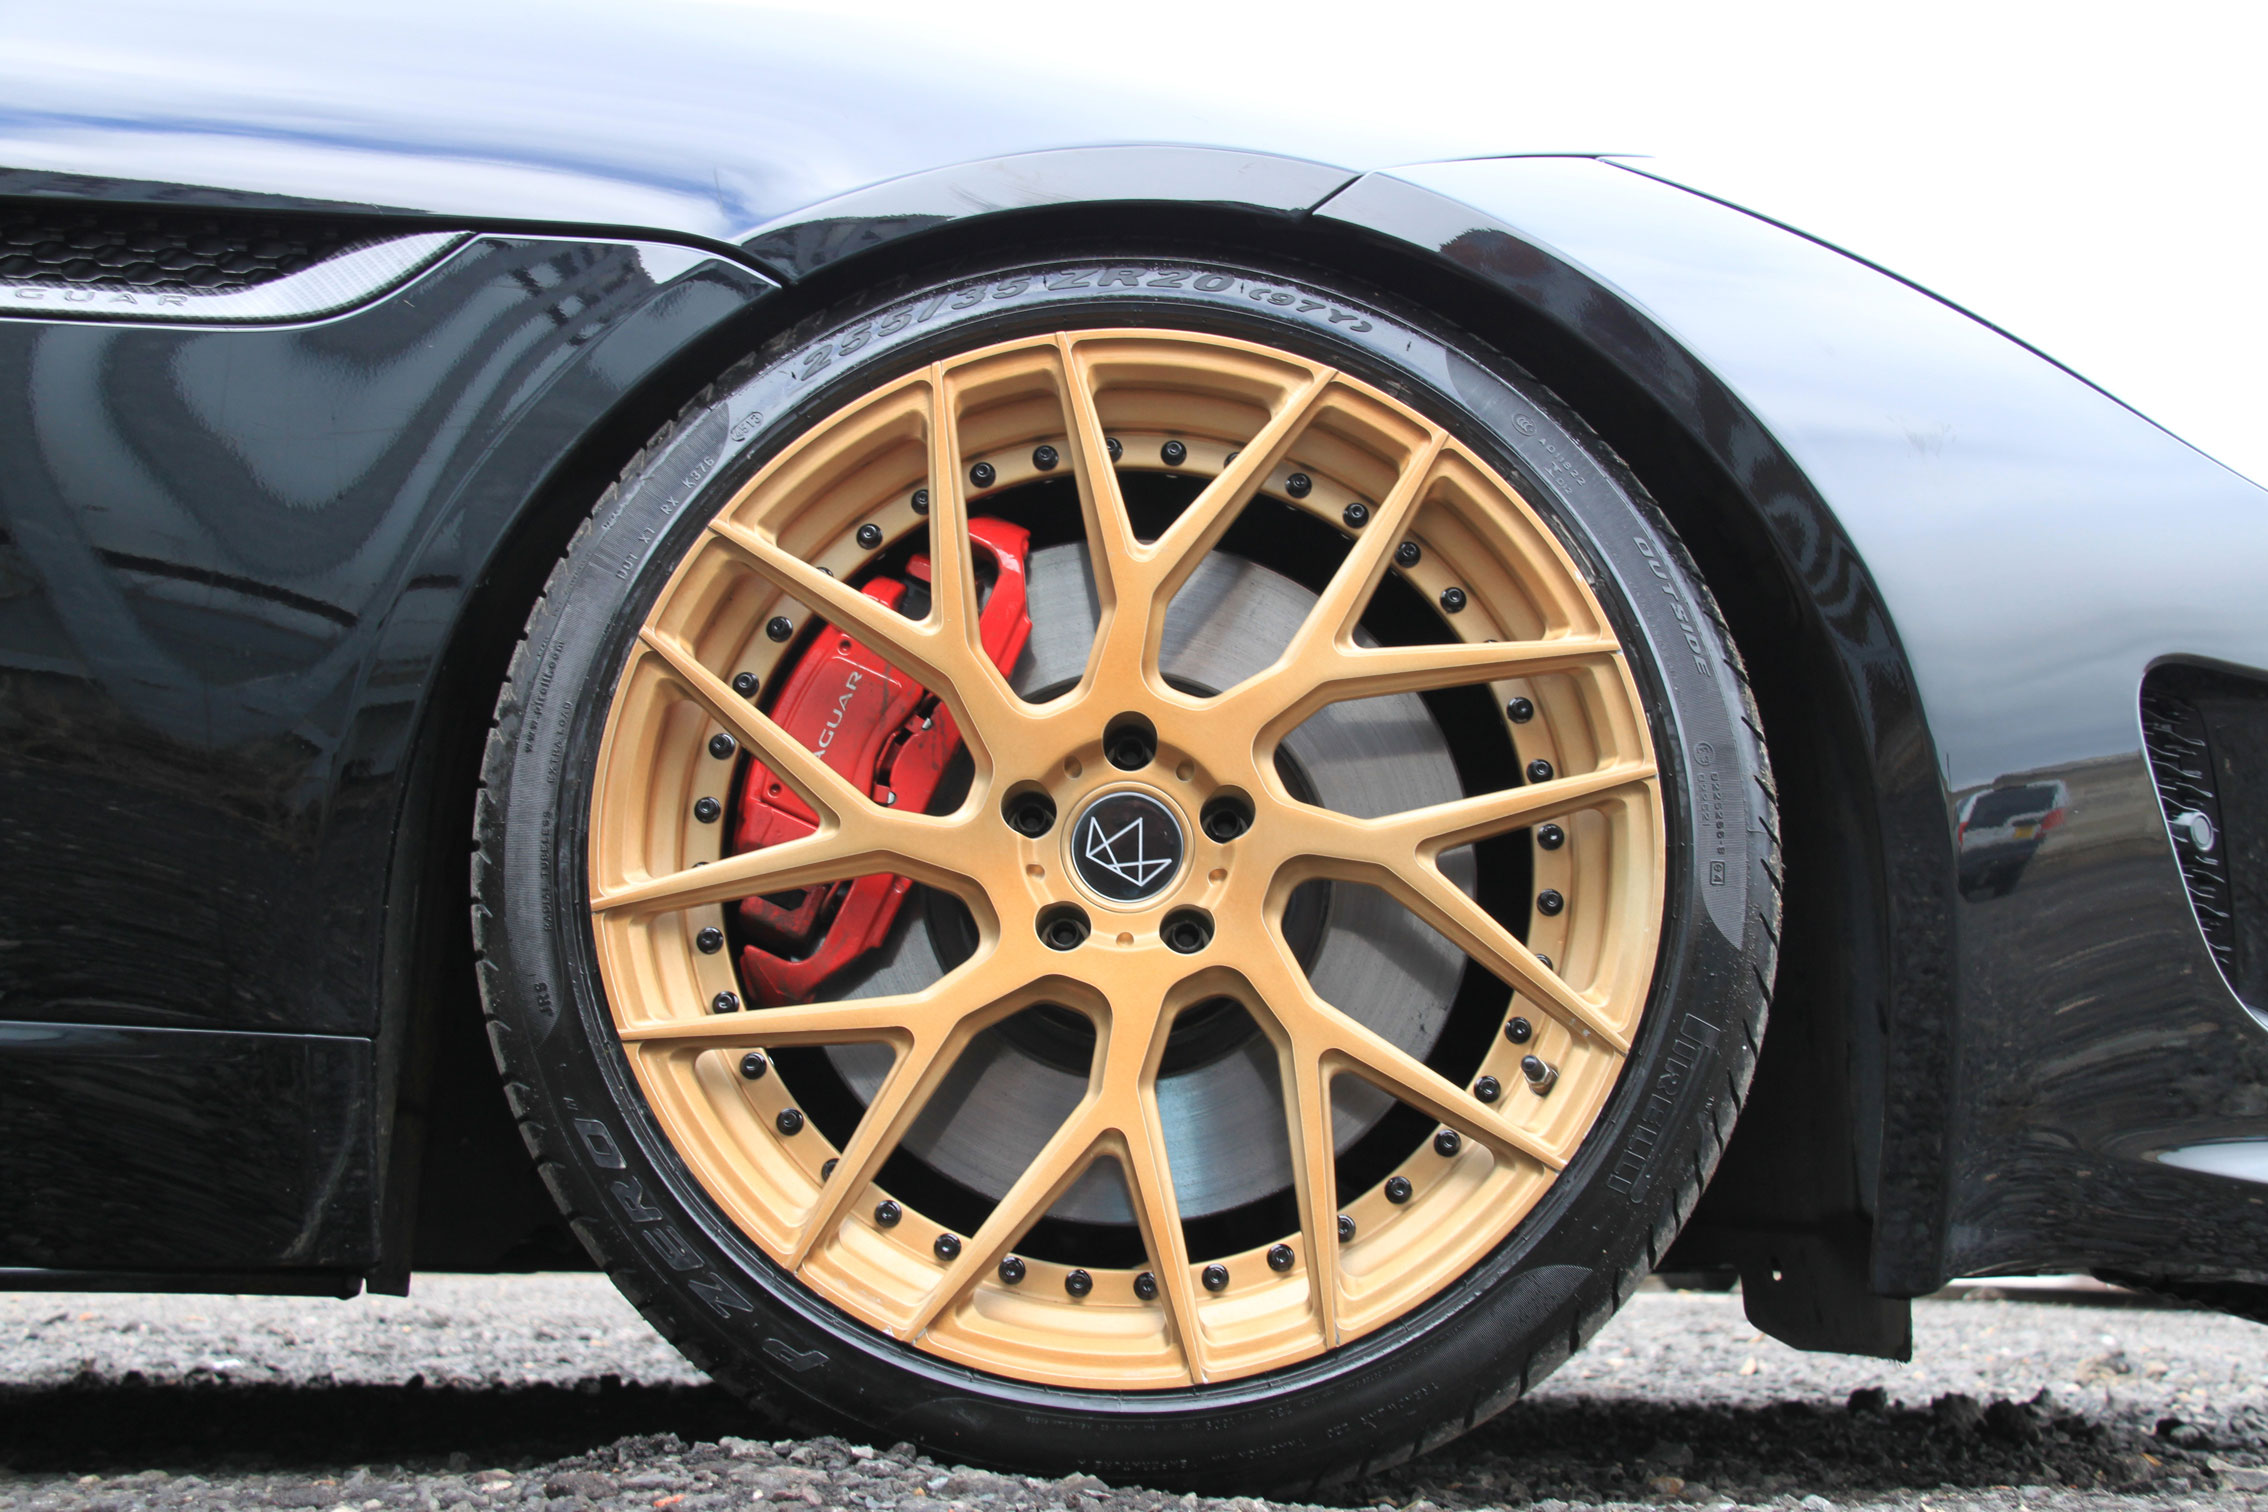 jaguar-F-type-wheel-gold.jpg